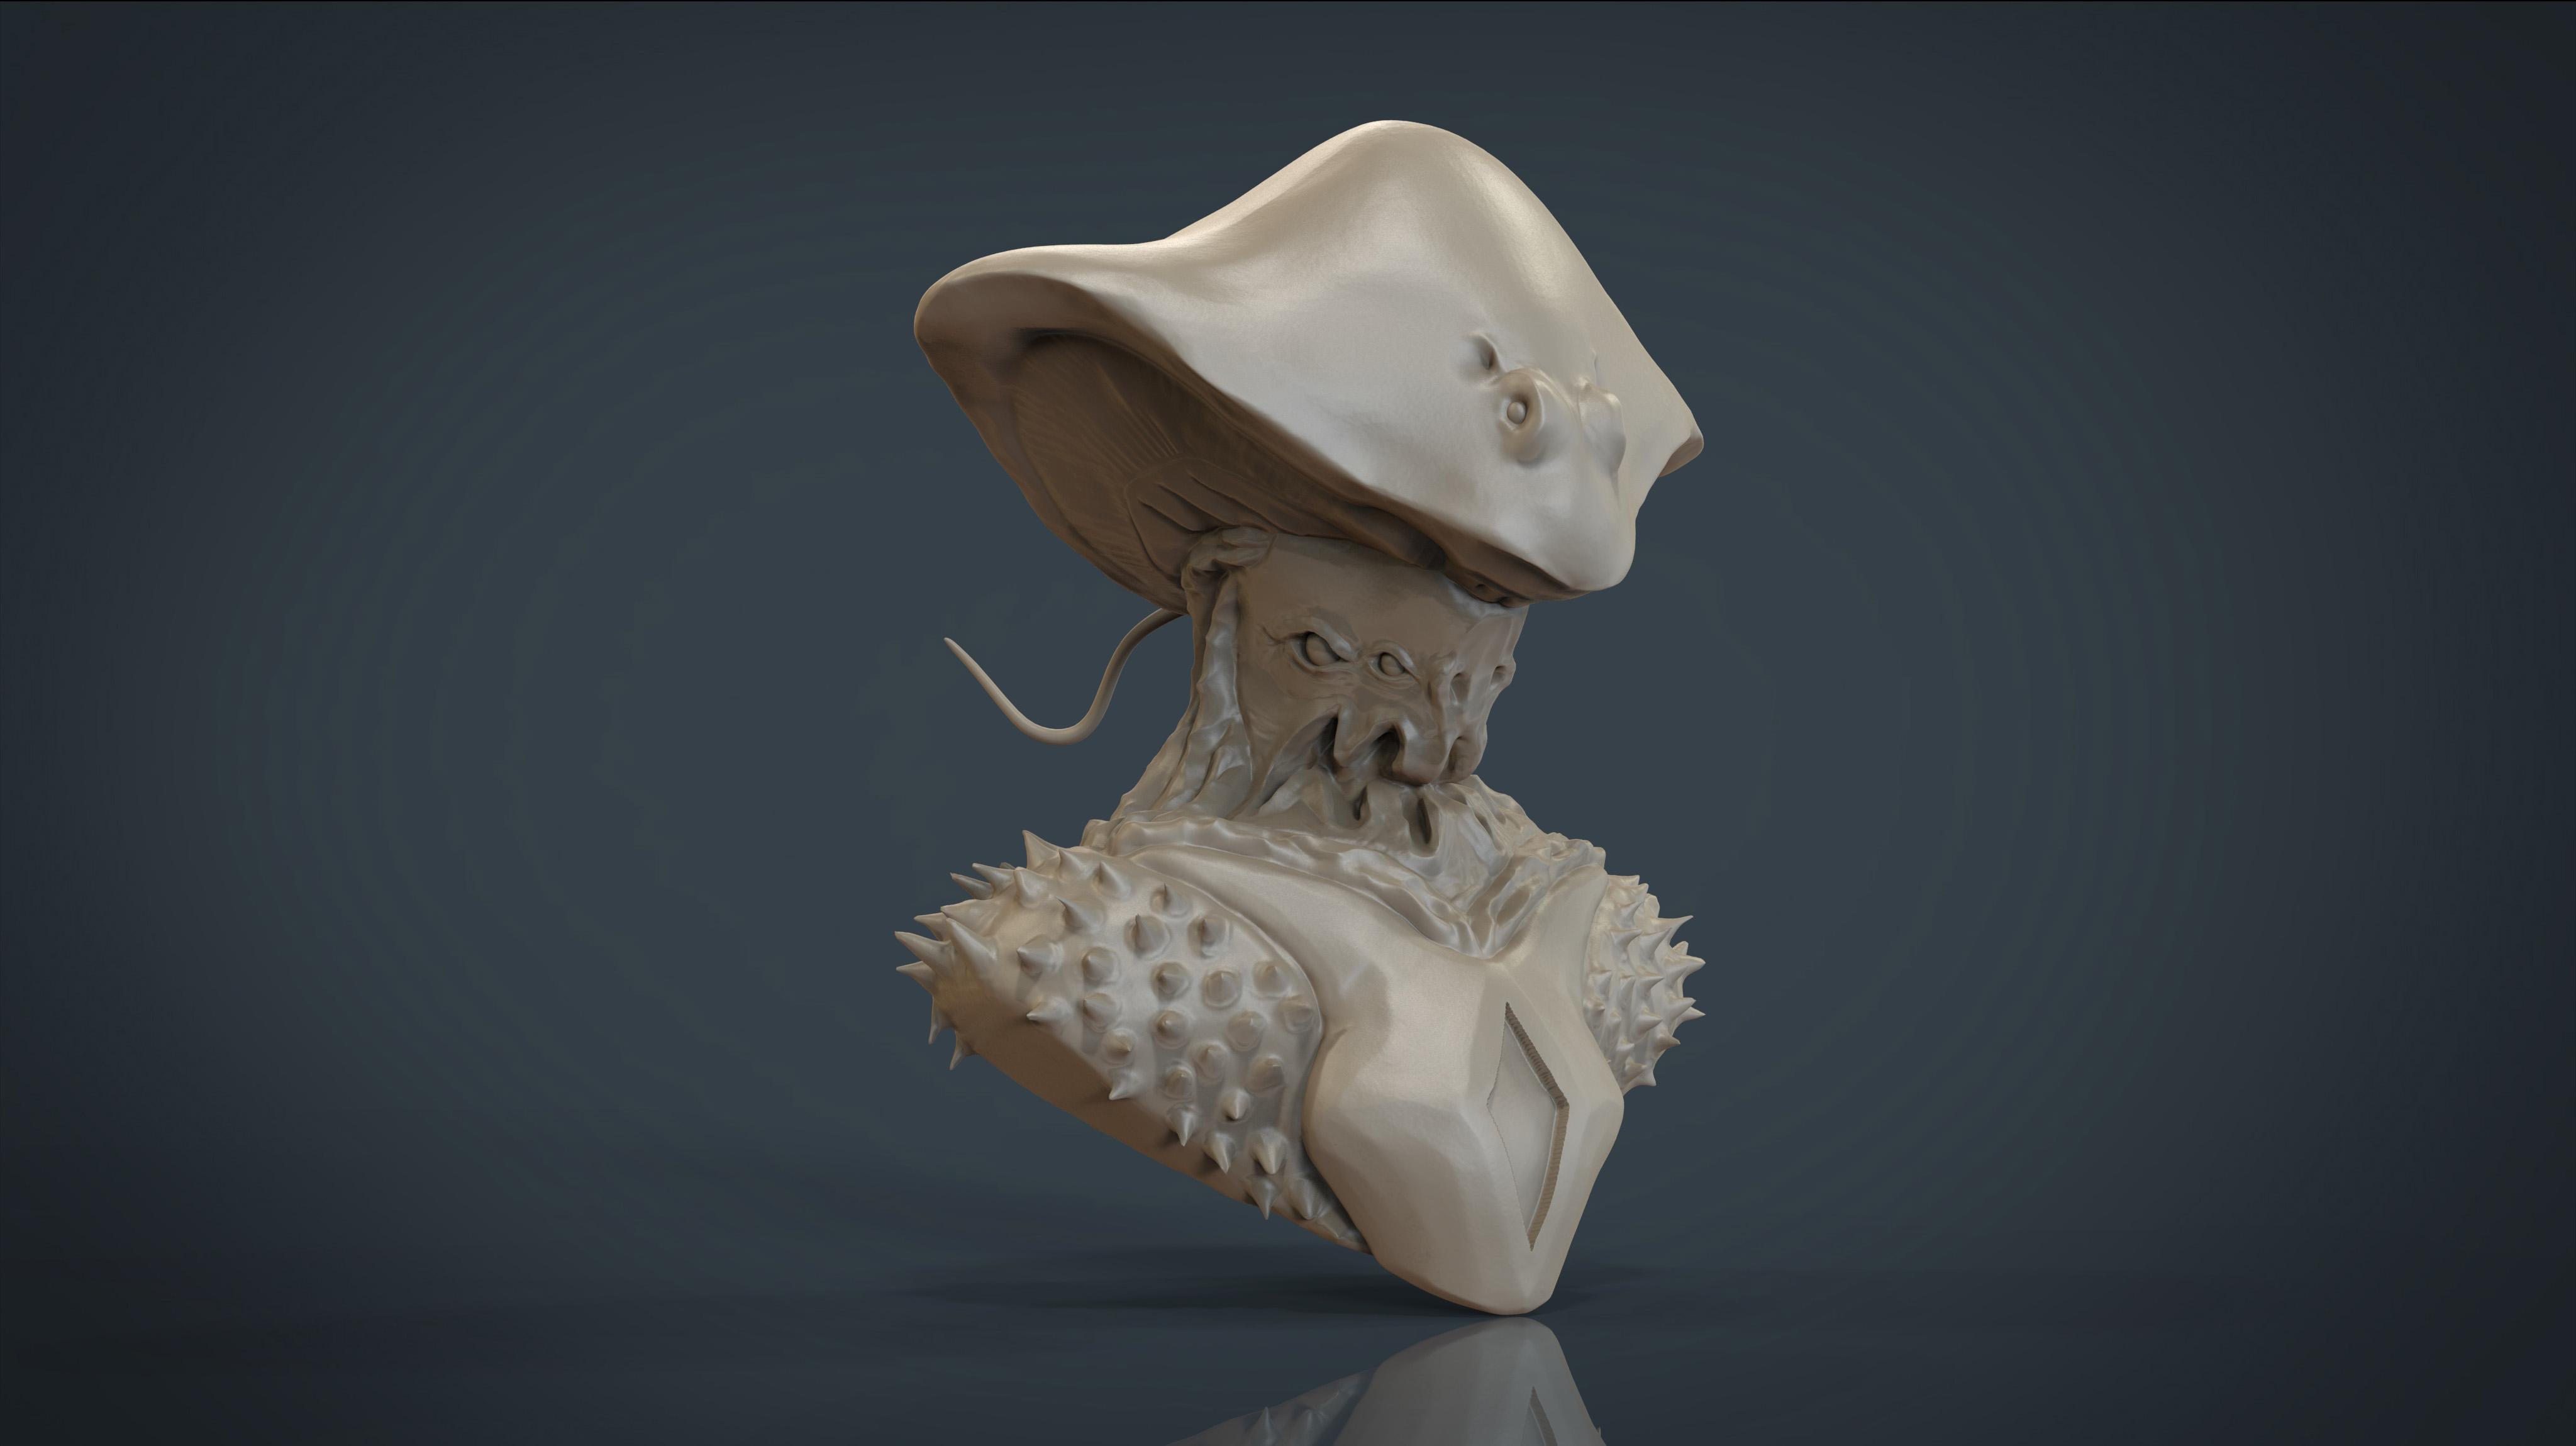 Pirate Captain Concept by T-Magnus